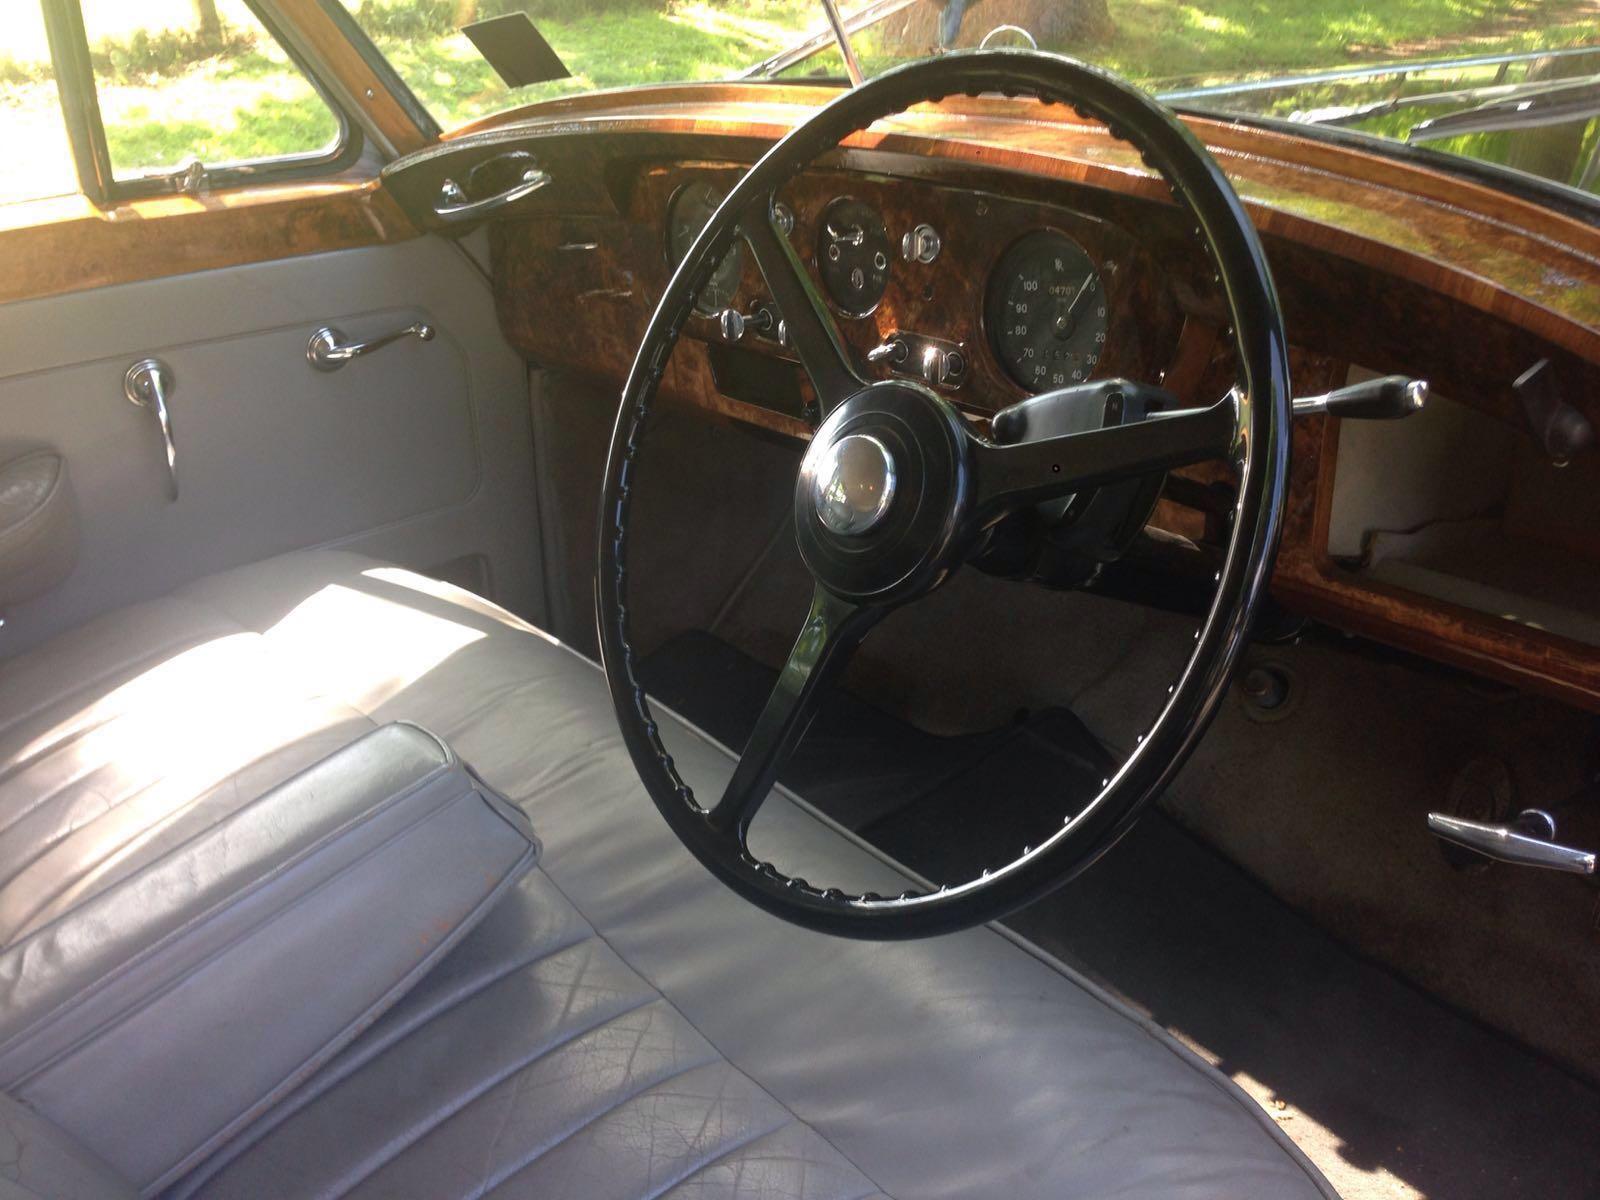 Rolls Royce Silver Cloud interior